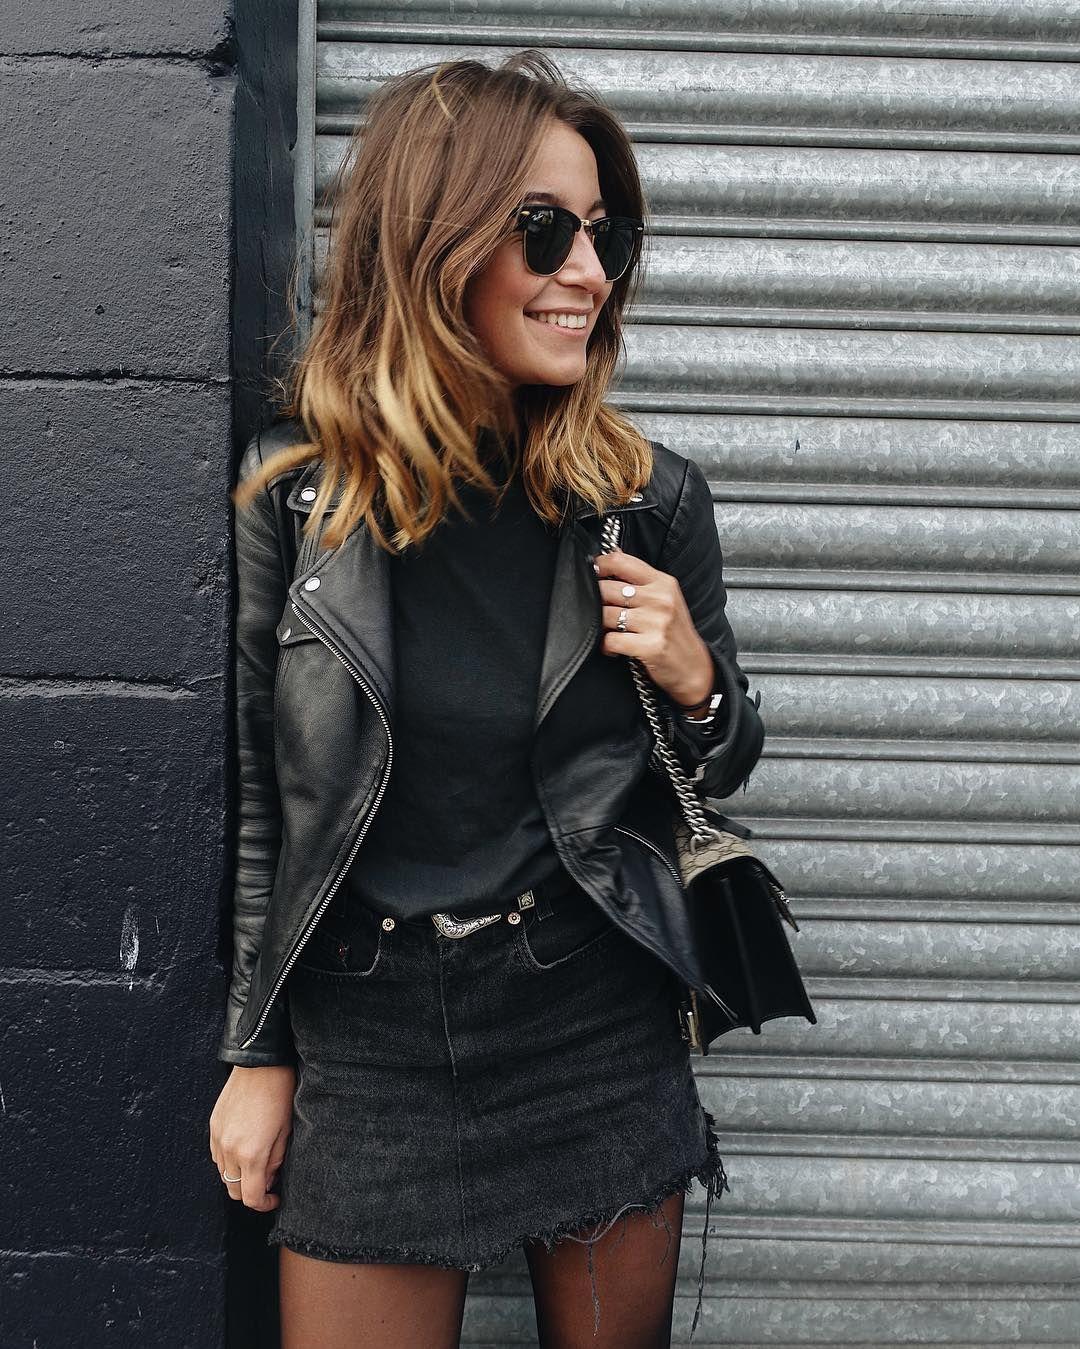 shades black belt black mini skirt and thin thighs | Looks